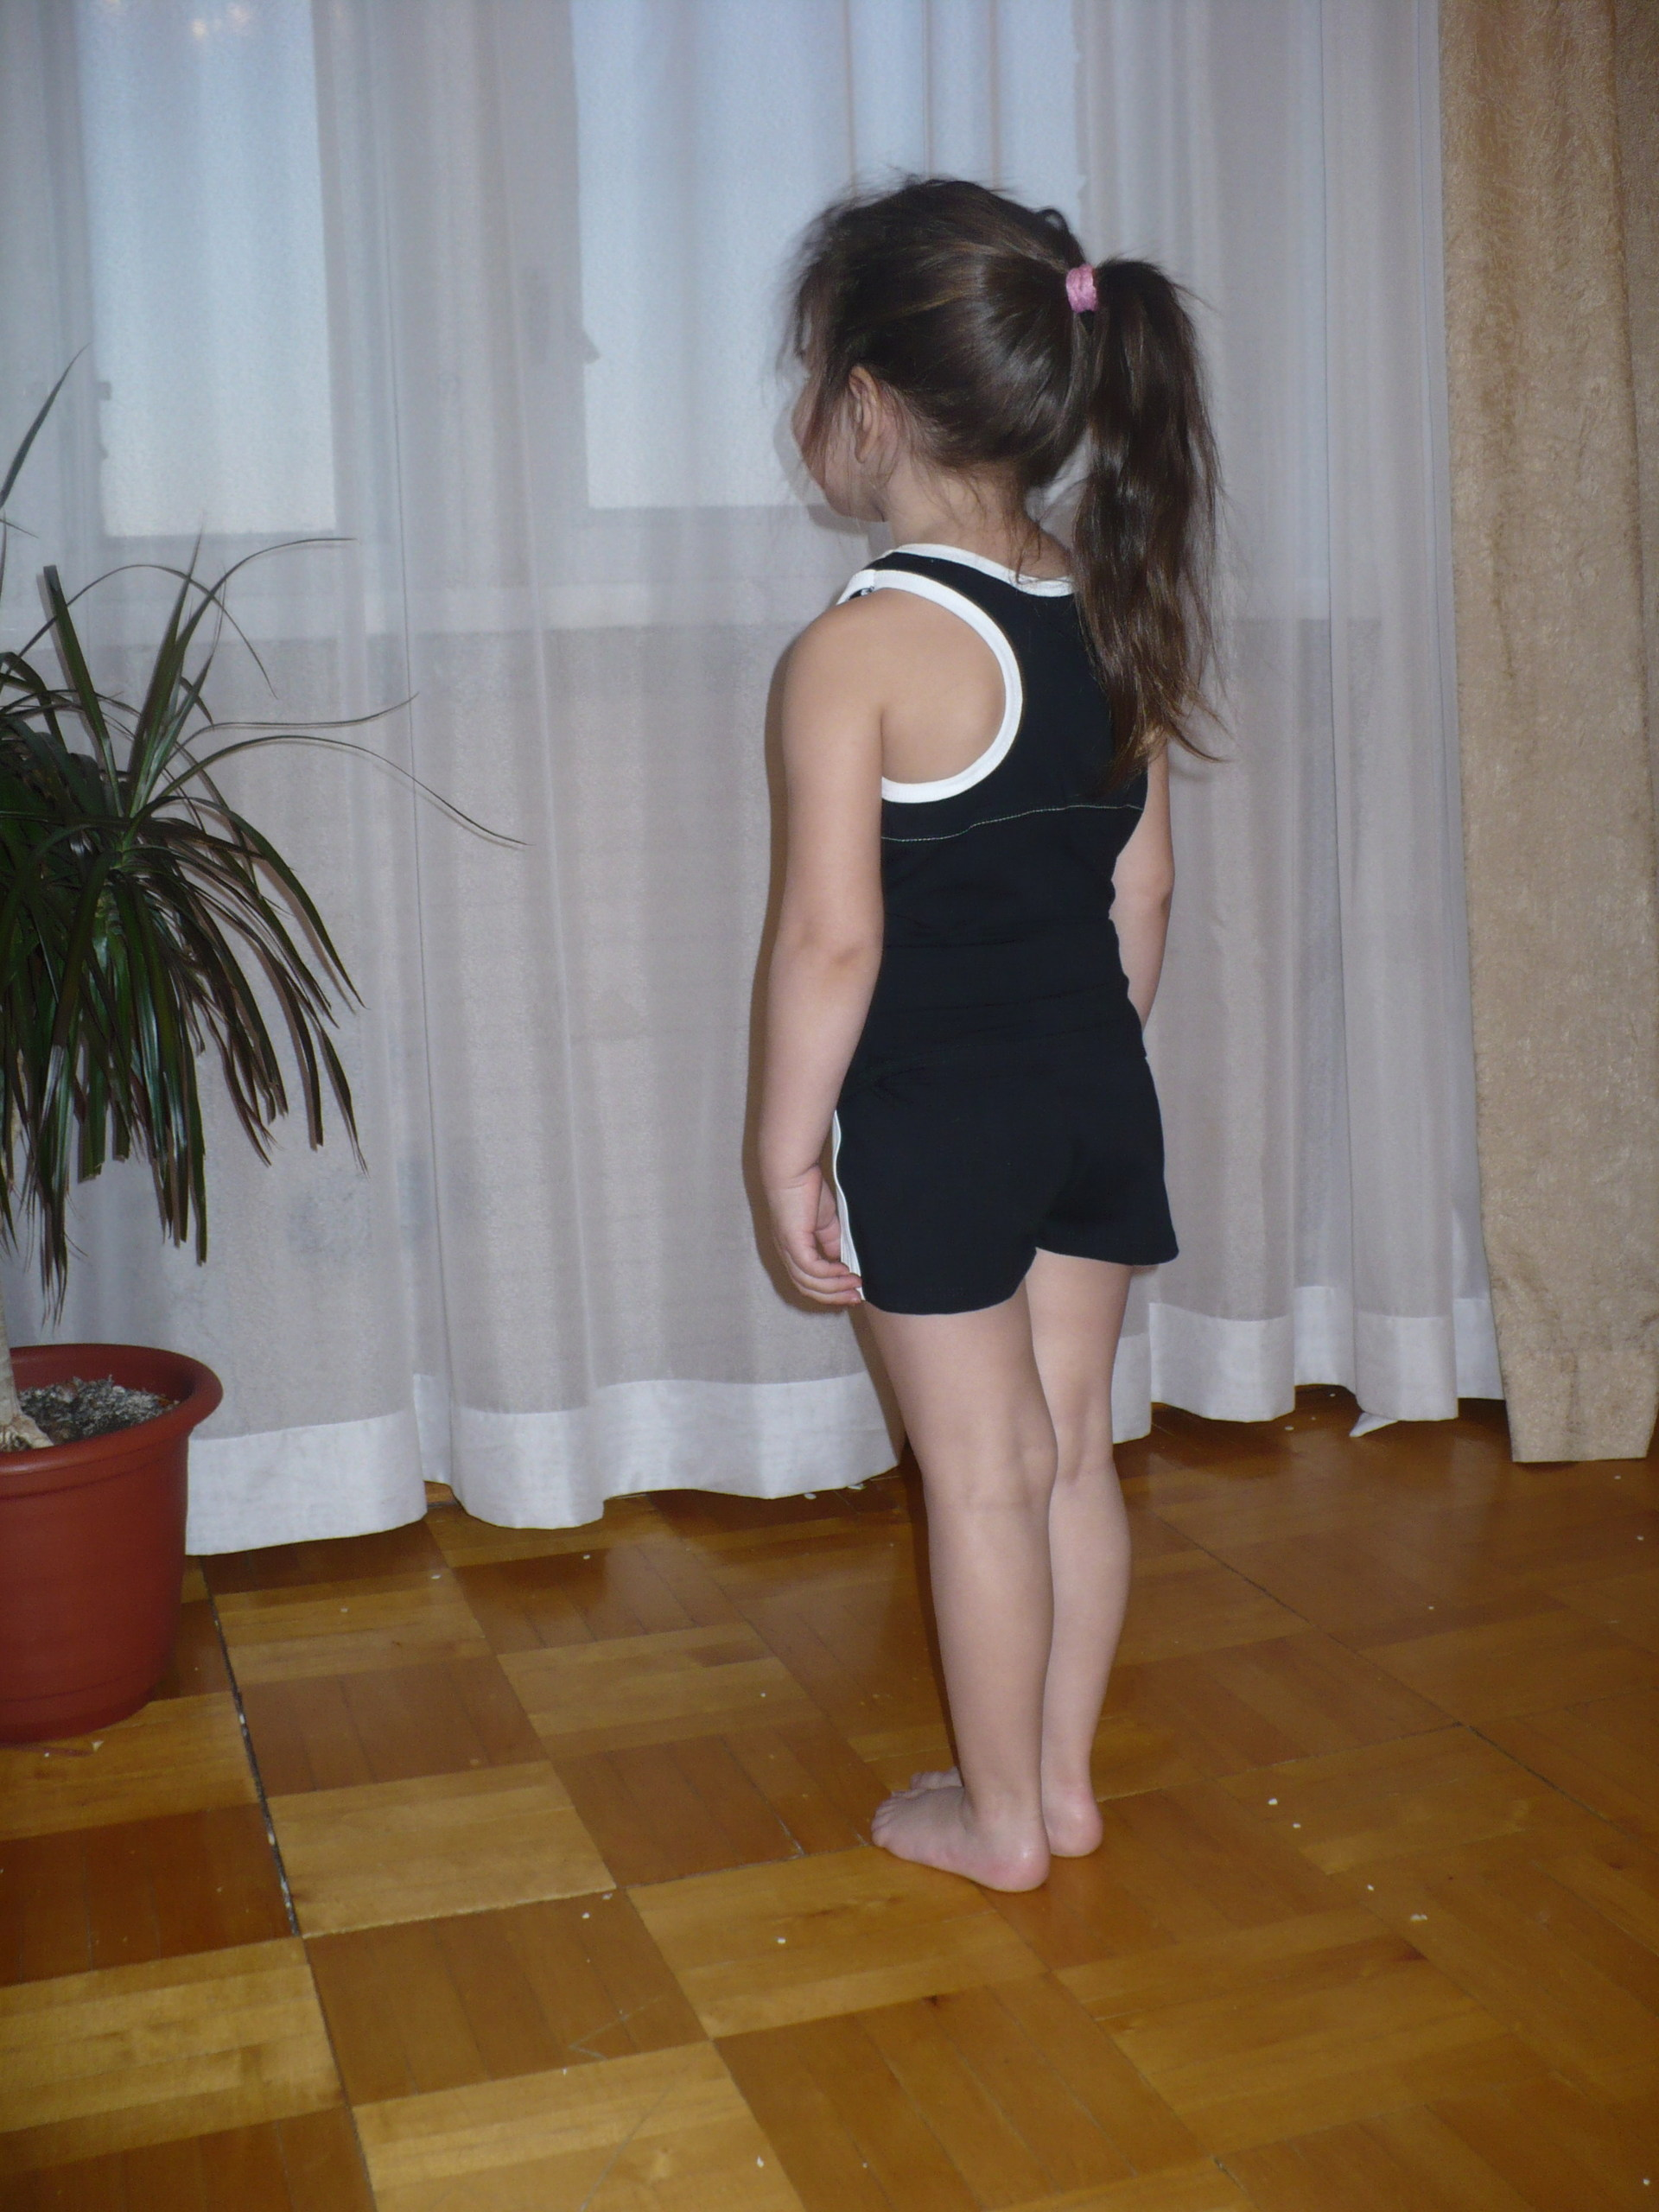 проститутки негритянки иркутск